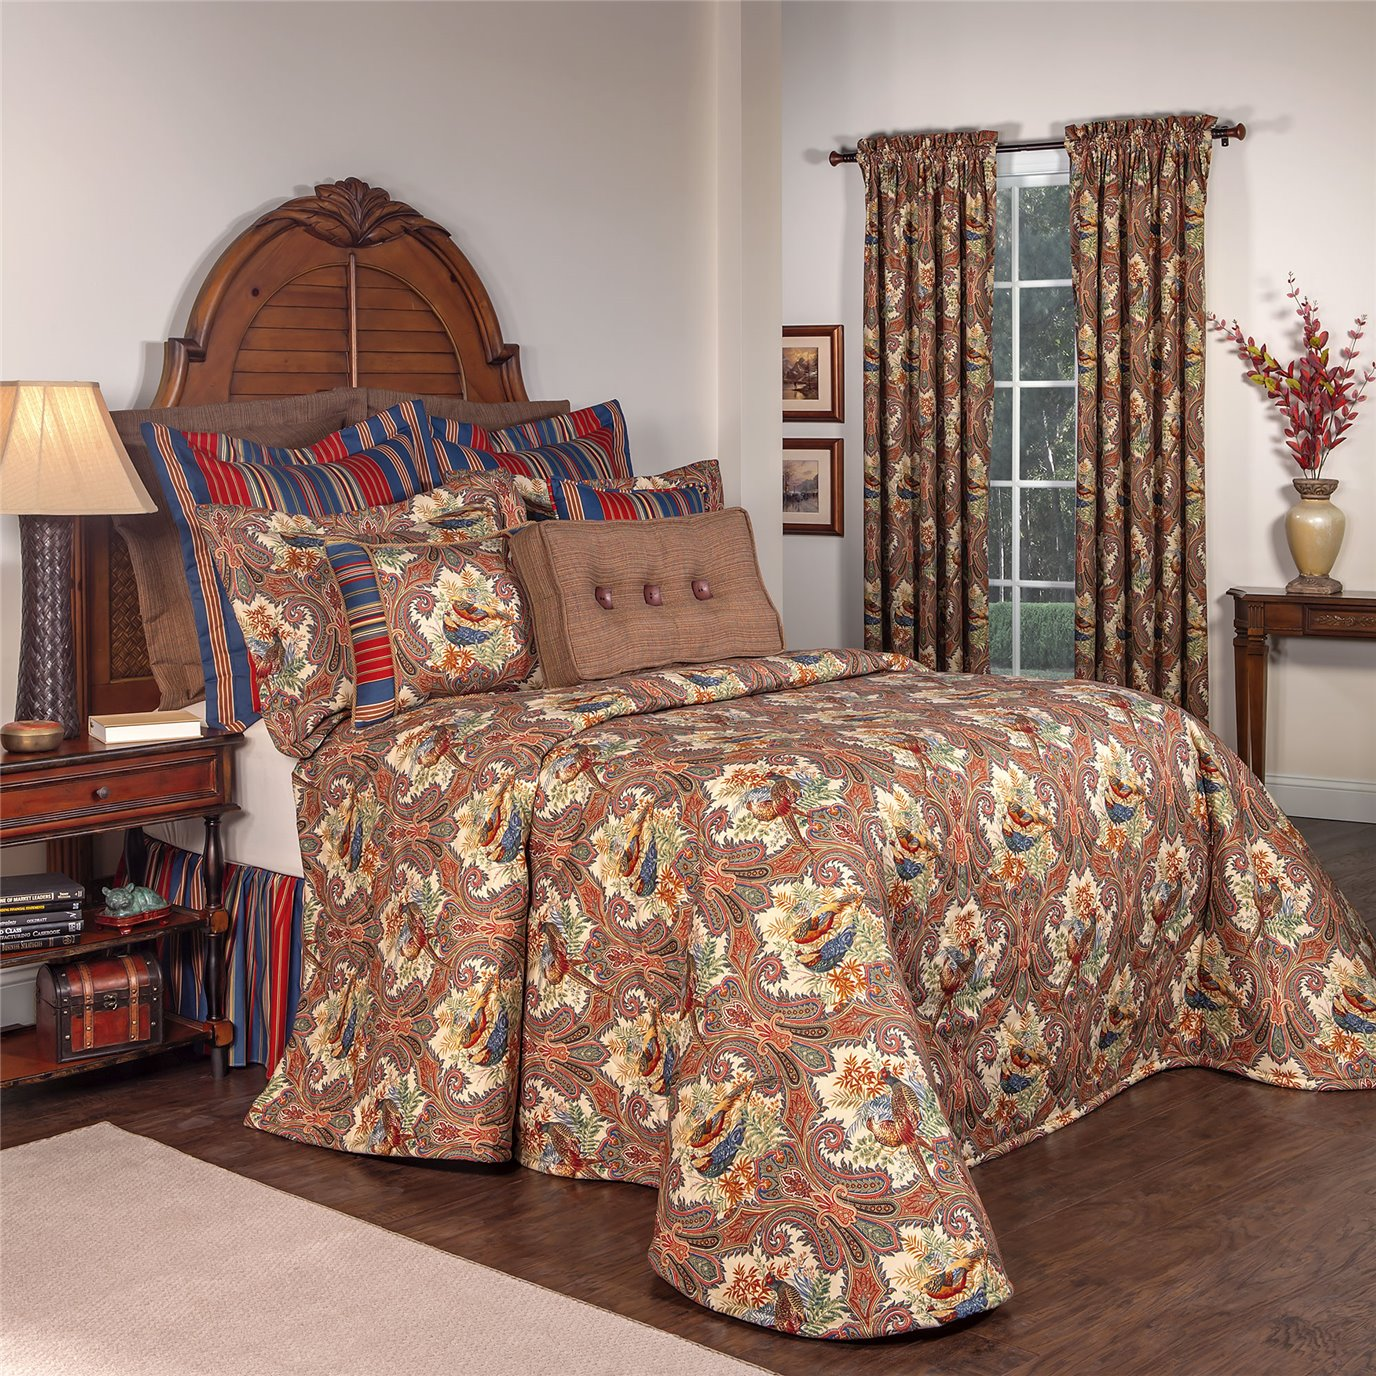 Royal Pheasant Full Bedspread